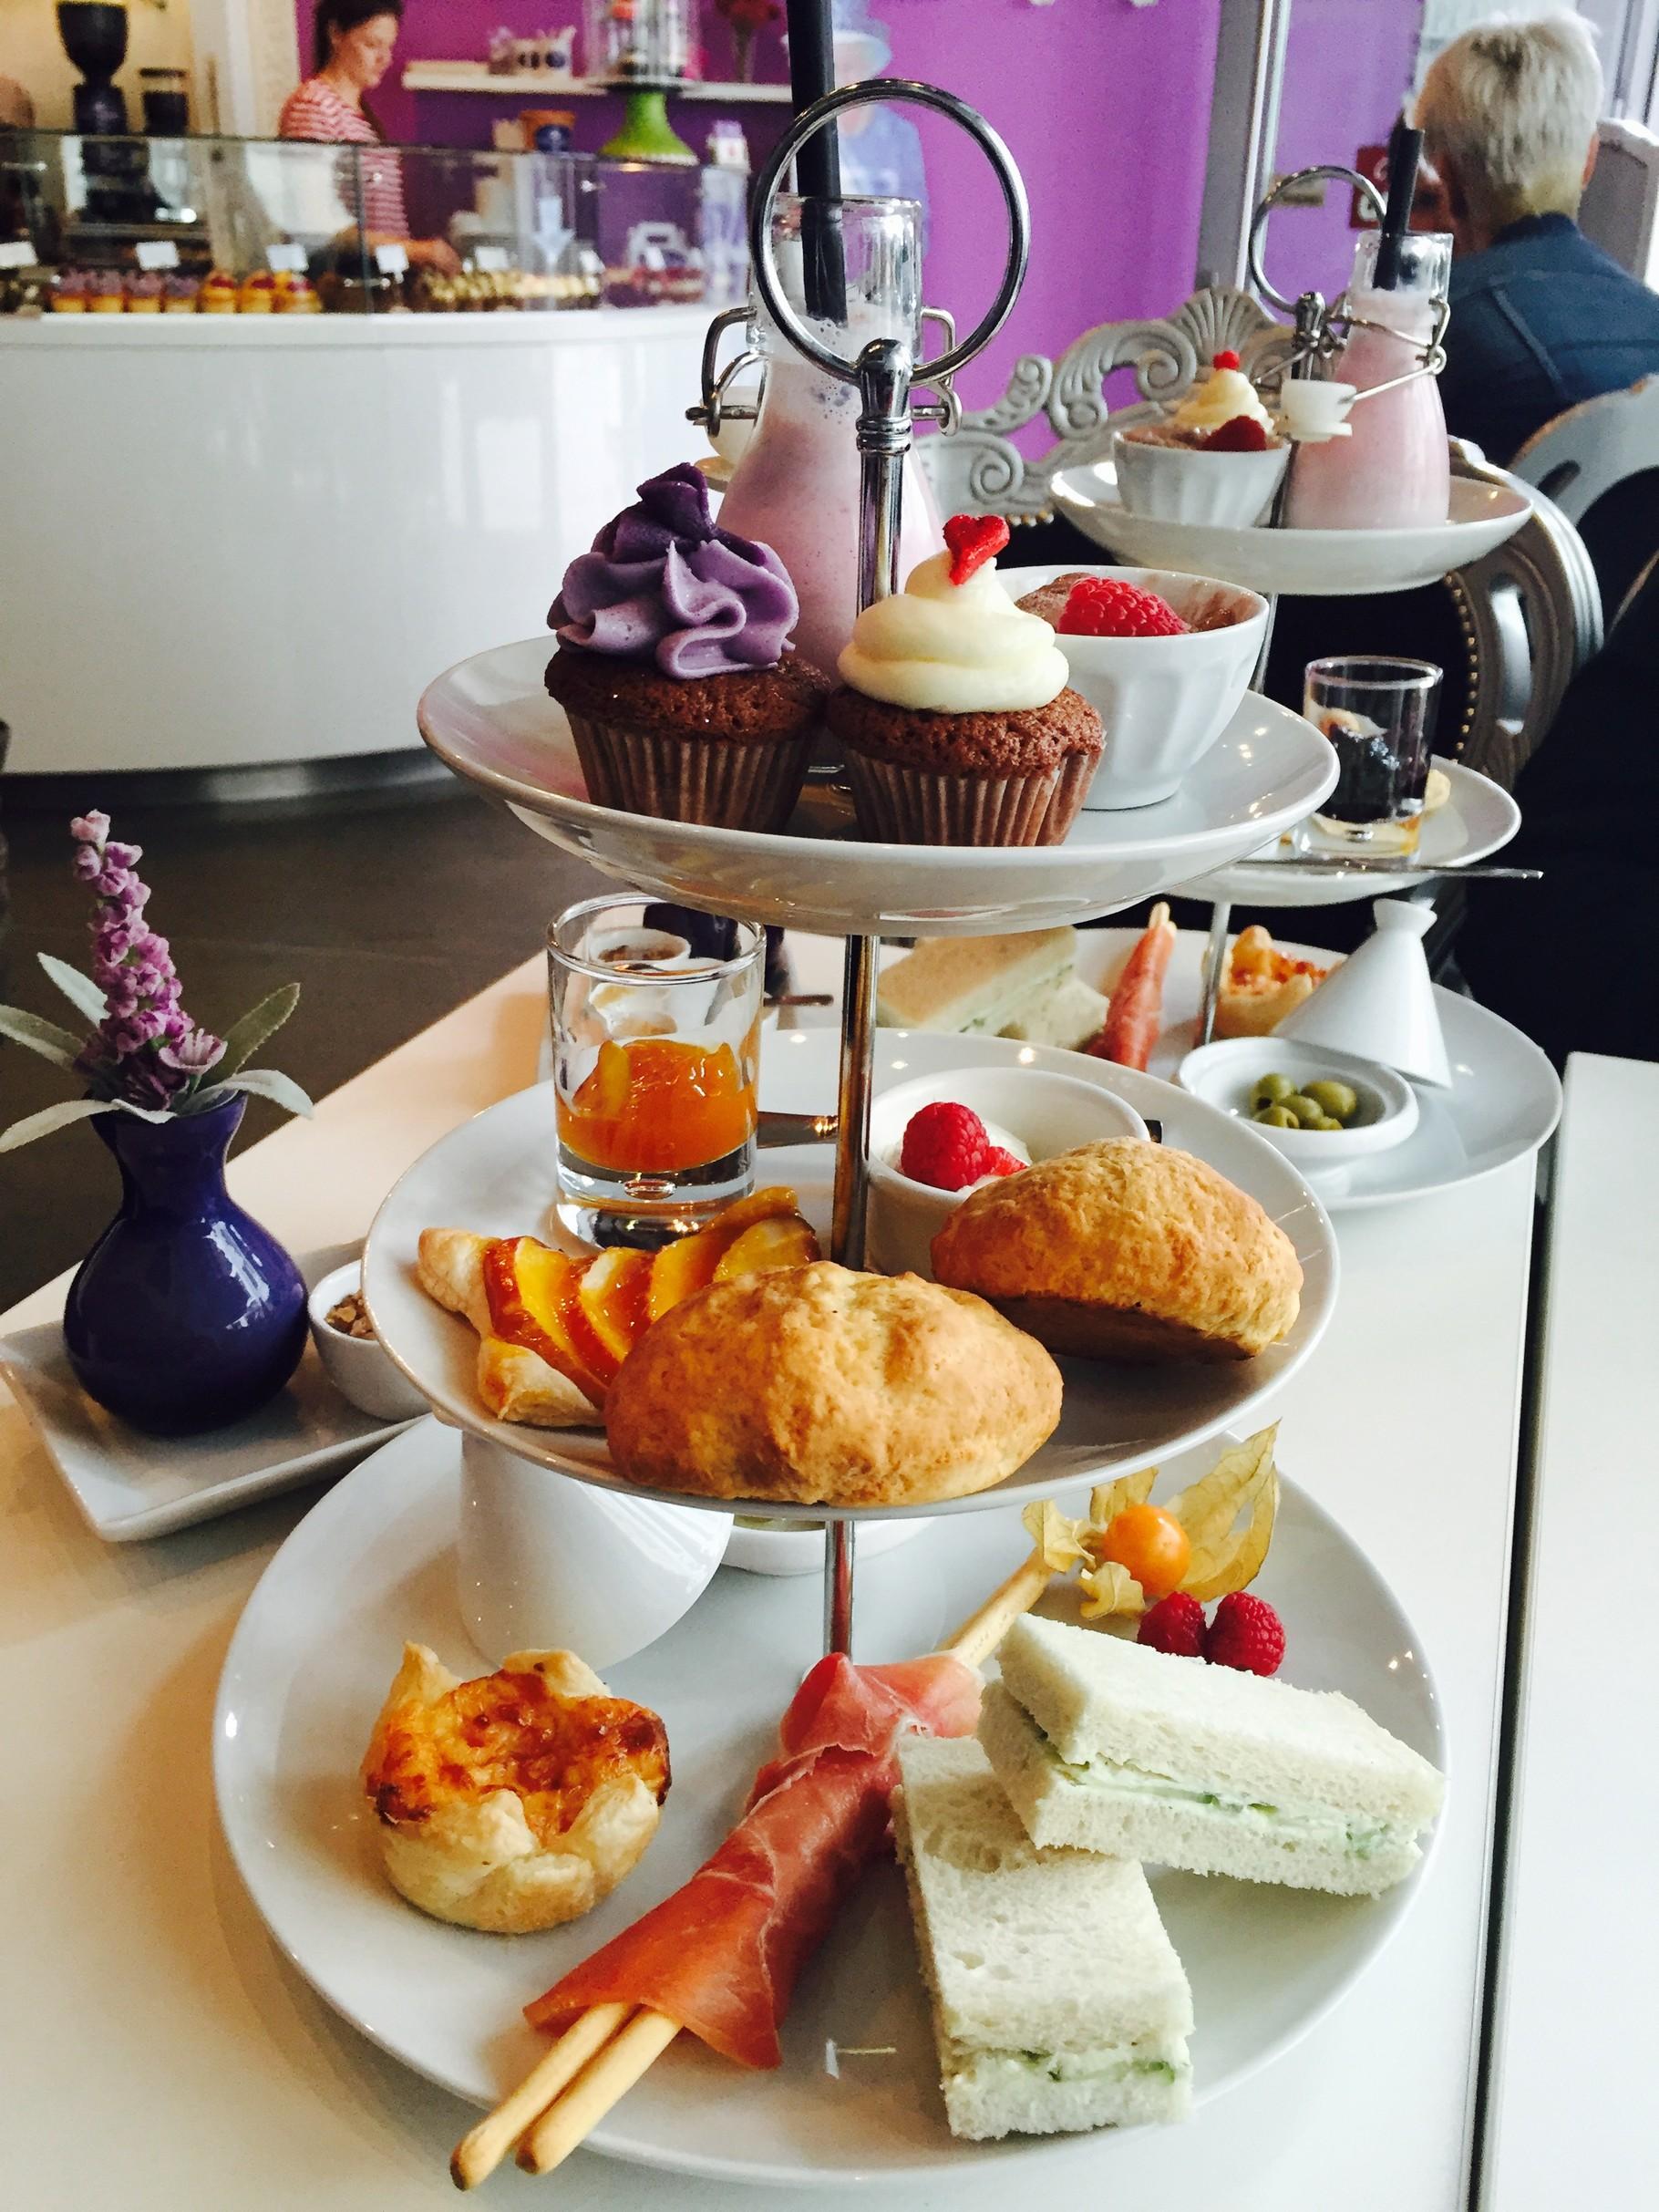 royal tea time bei royal cupcakes in k ln erfahrungsbericht tuerkische rezepte foodblog. Black Bedroom Furniture Sets. Home Design Ideas